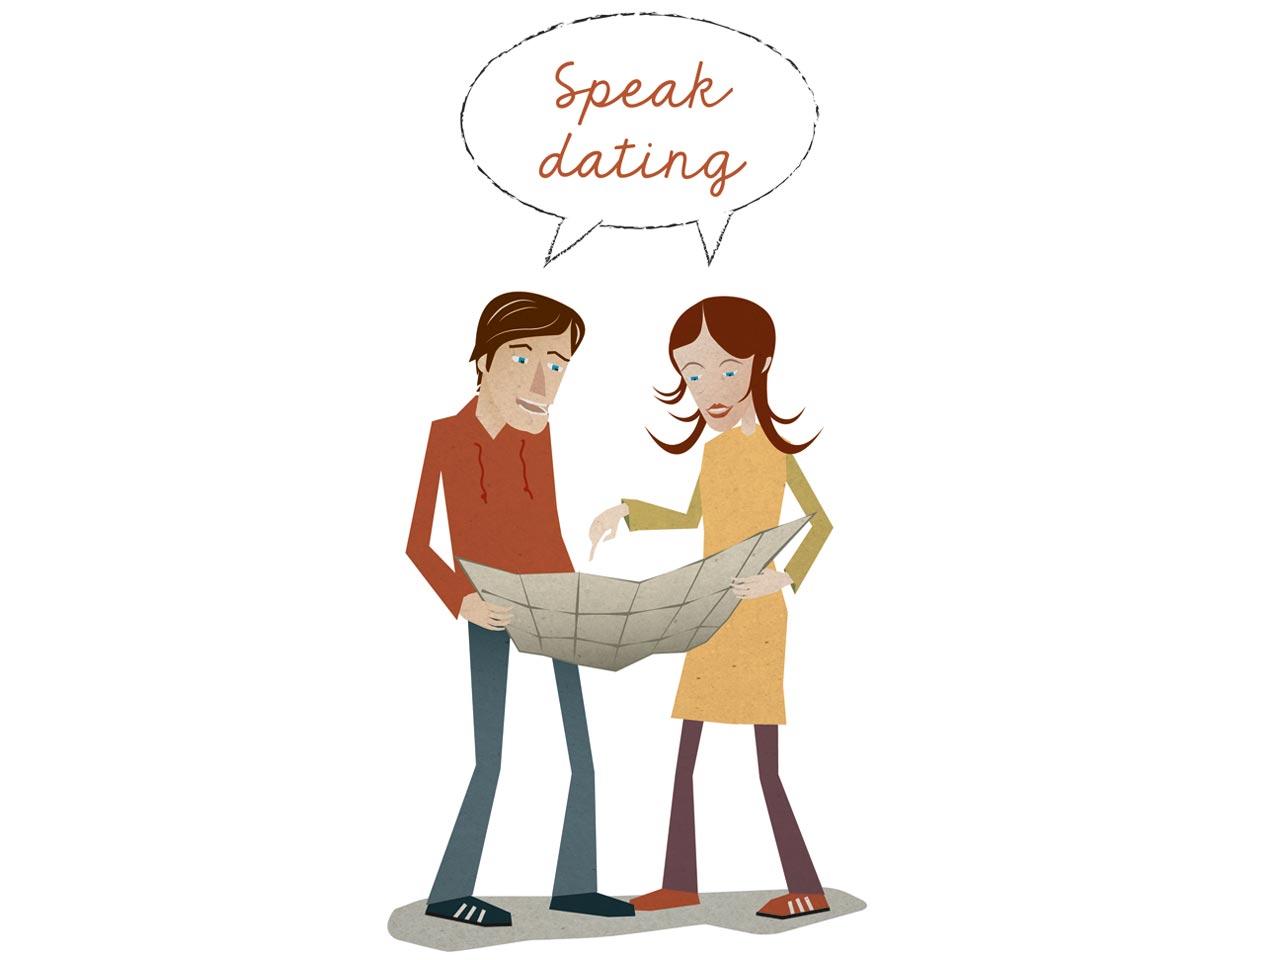 Speak dating linz Εμπορικα καταστηματα θεσσαλονικης